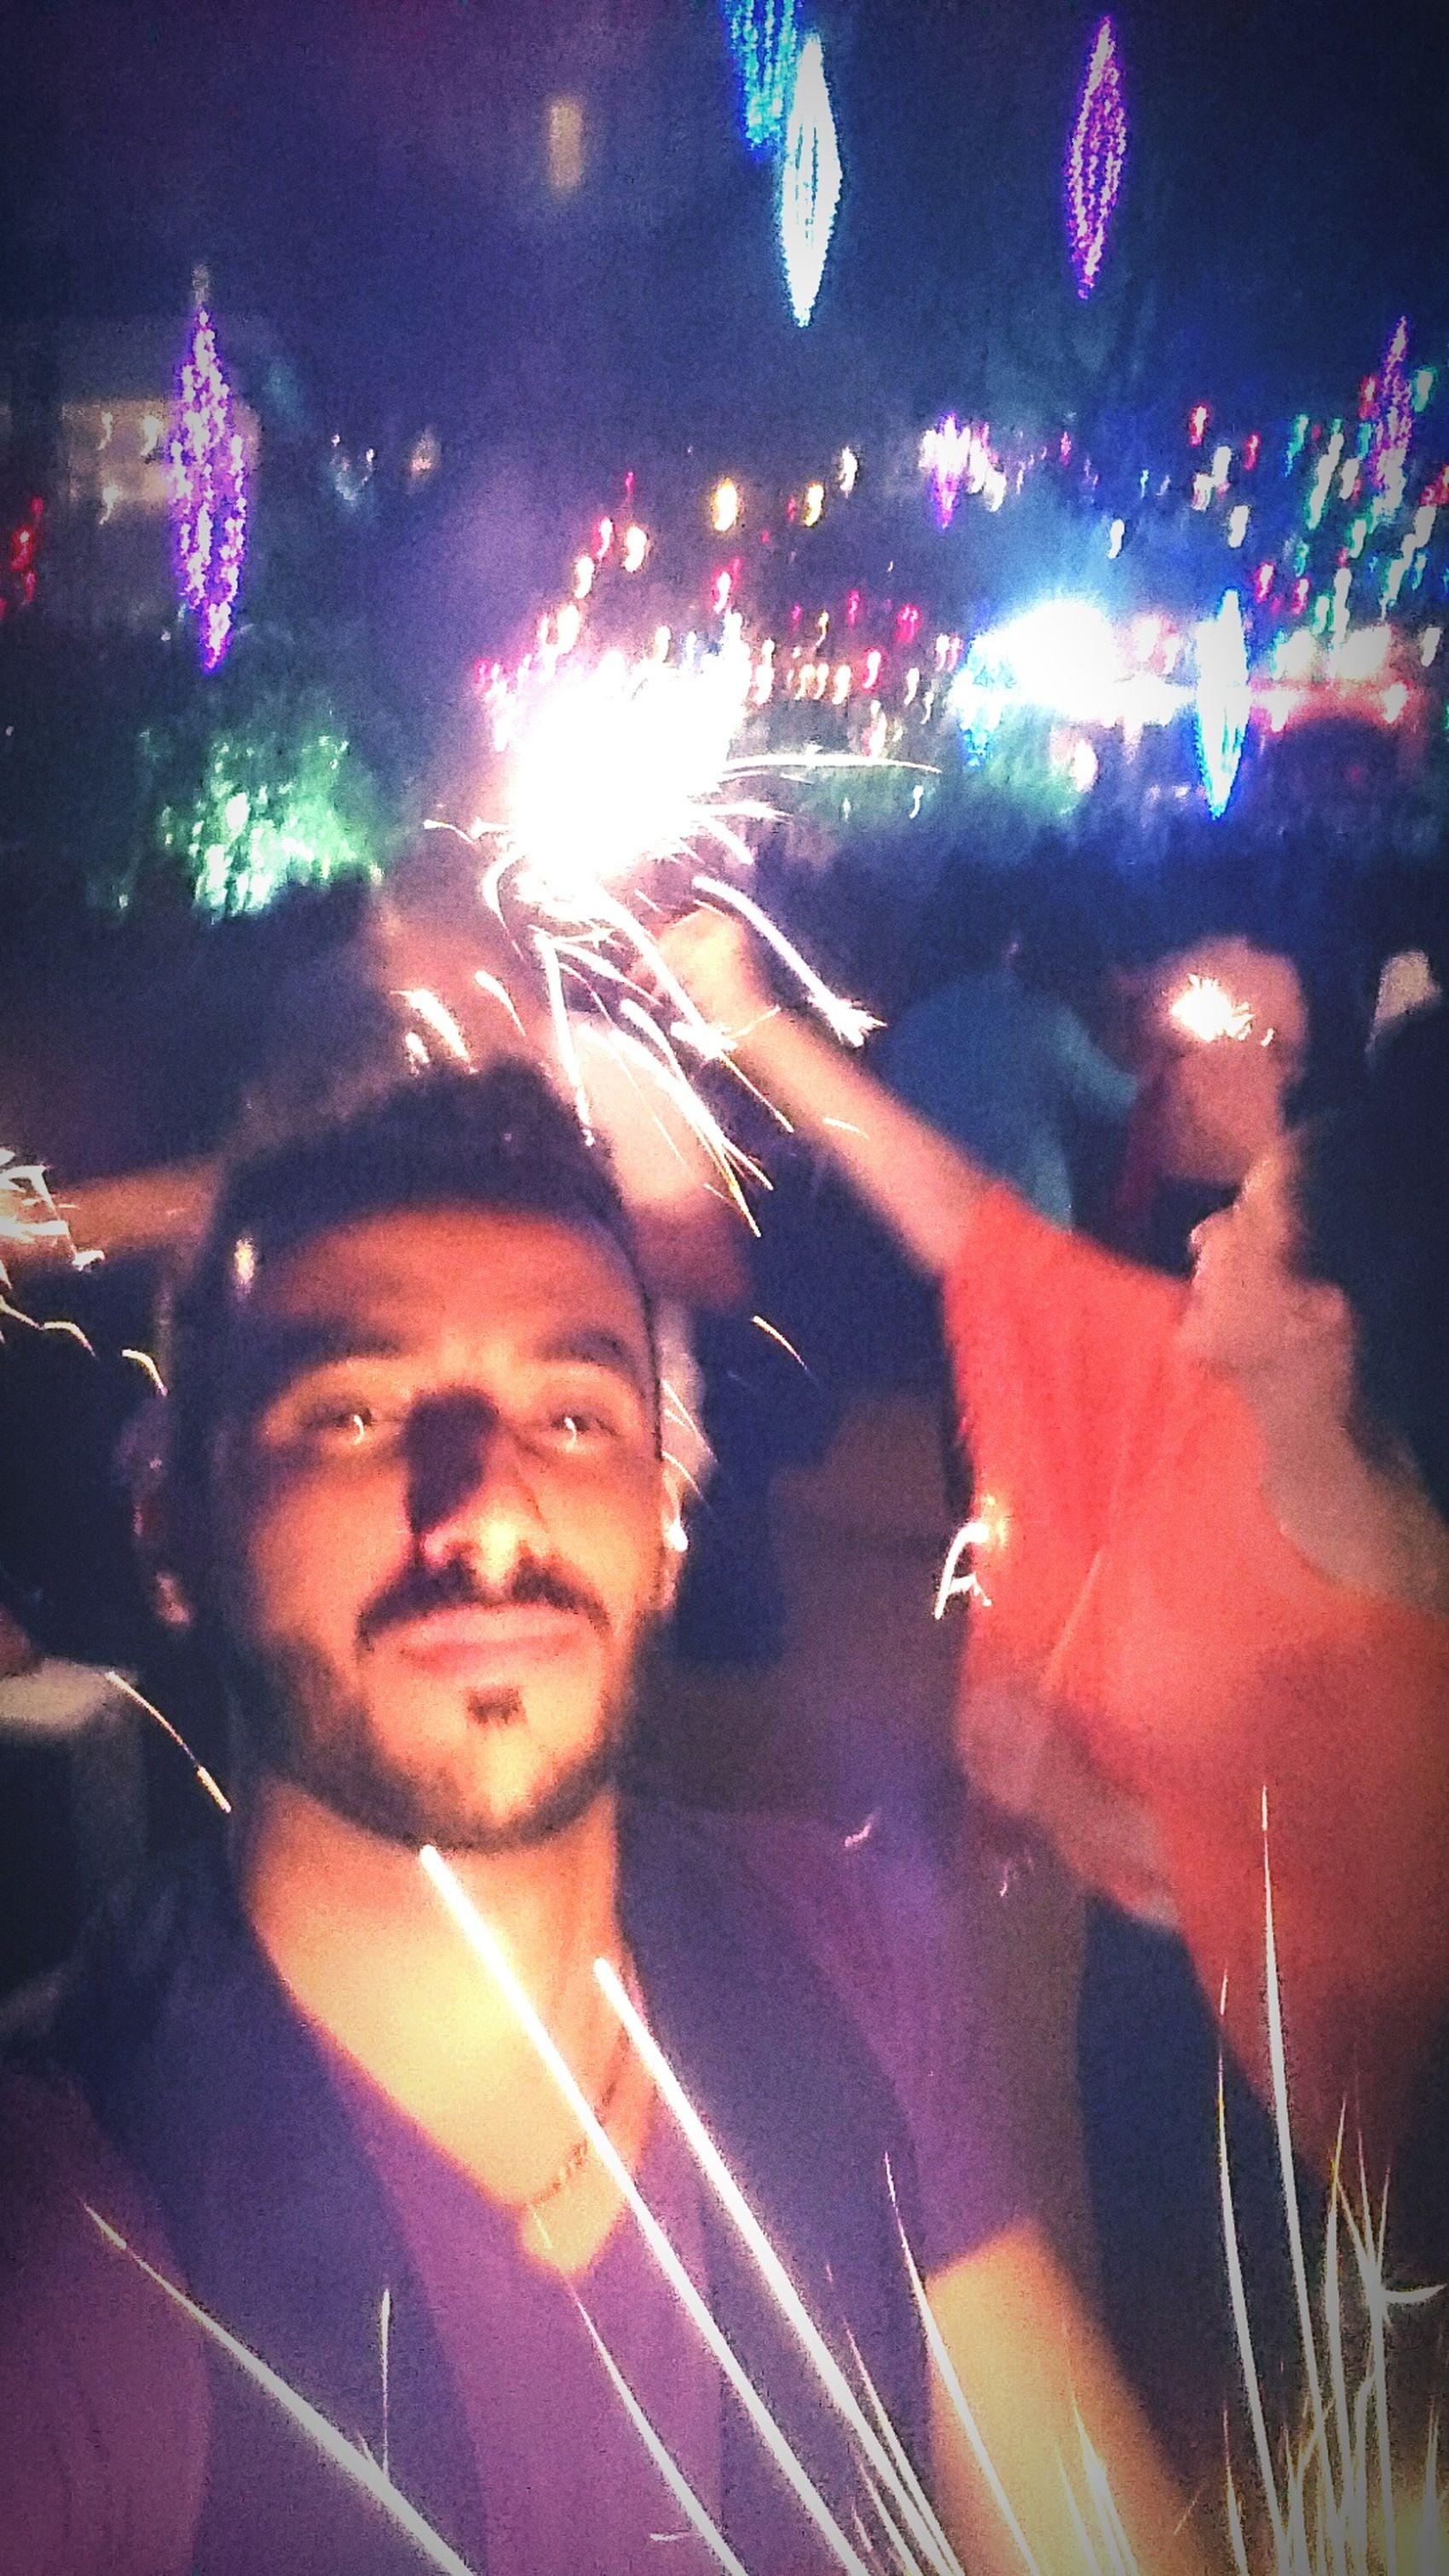 Colmbo new years 2015 Colombo Cineman Grand Hotel ... Happy New Year 2015